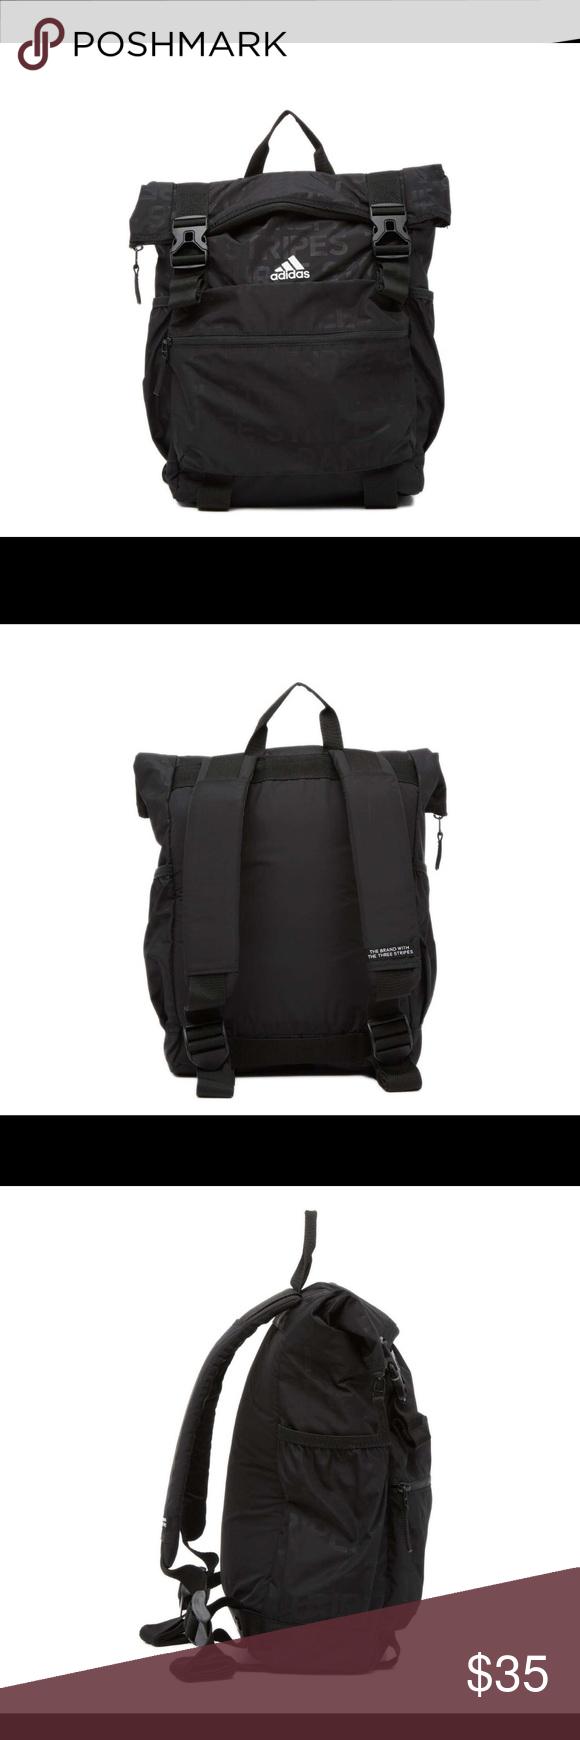 Adidas brand new black Yola backpack NWT Adidas brand new still in package  black Yola backpack f806c077d8